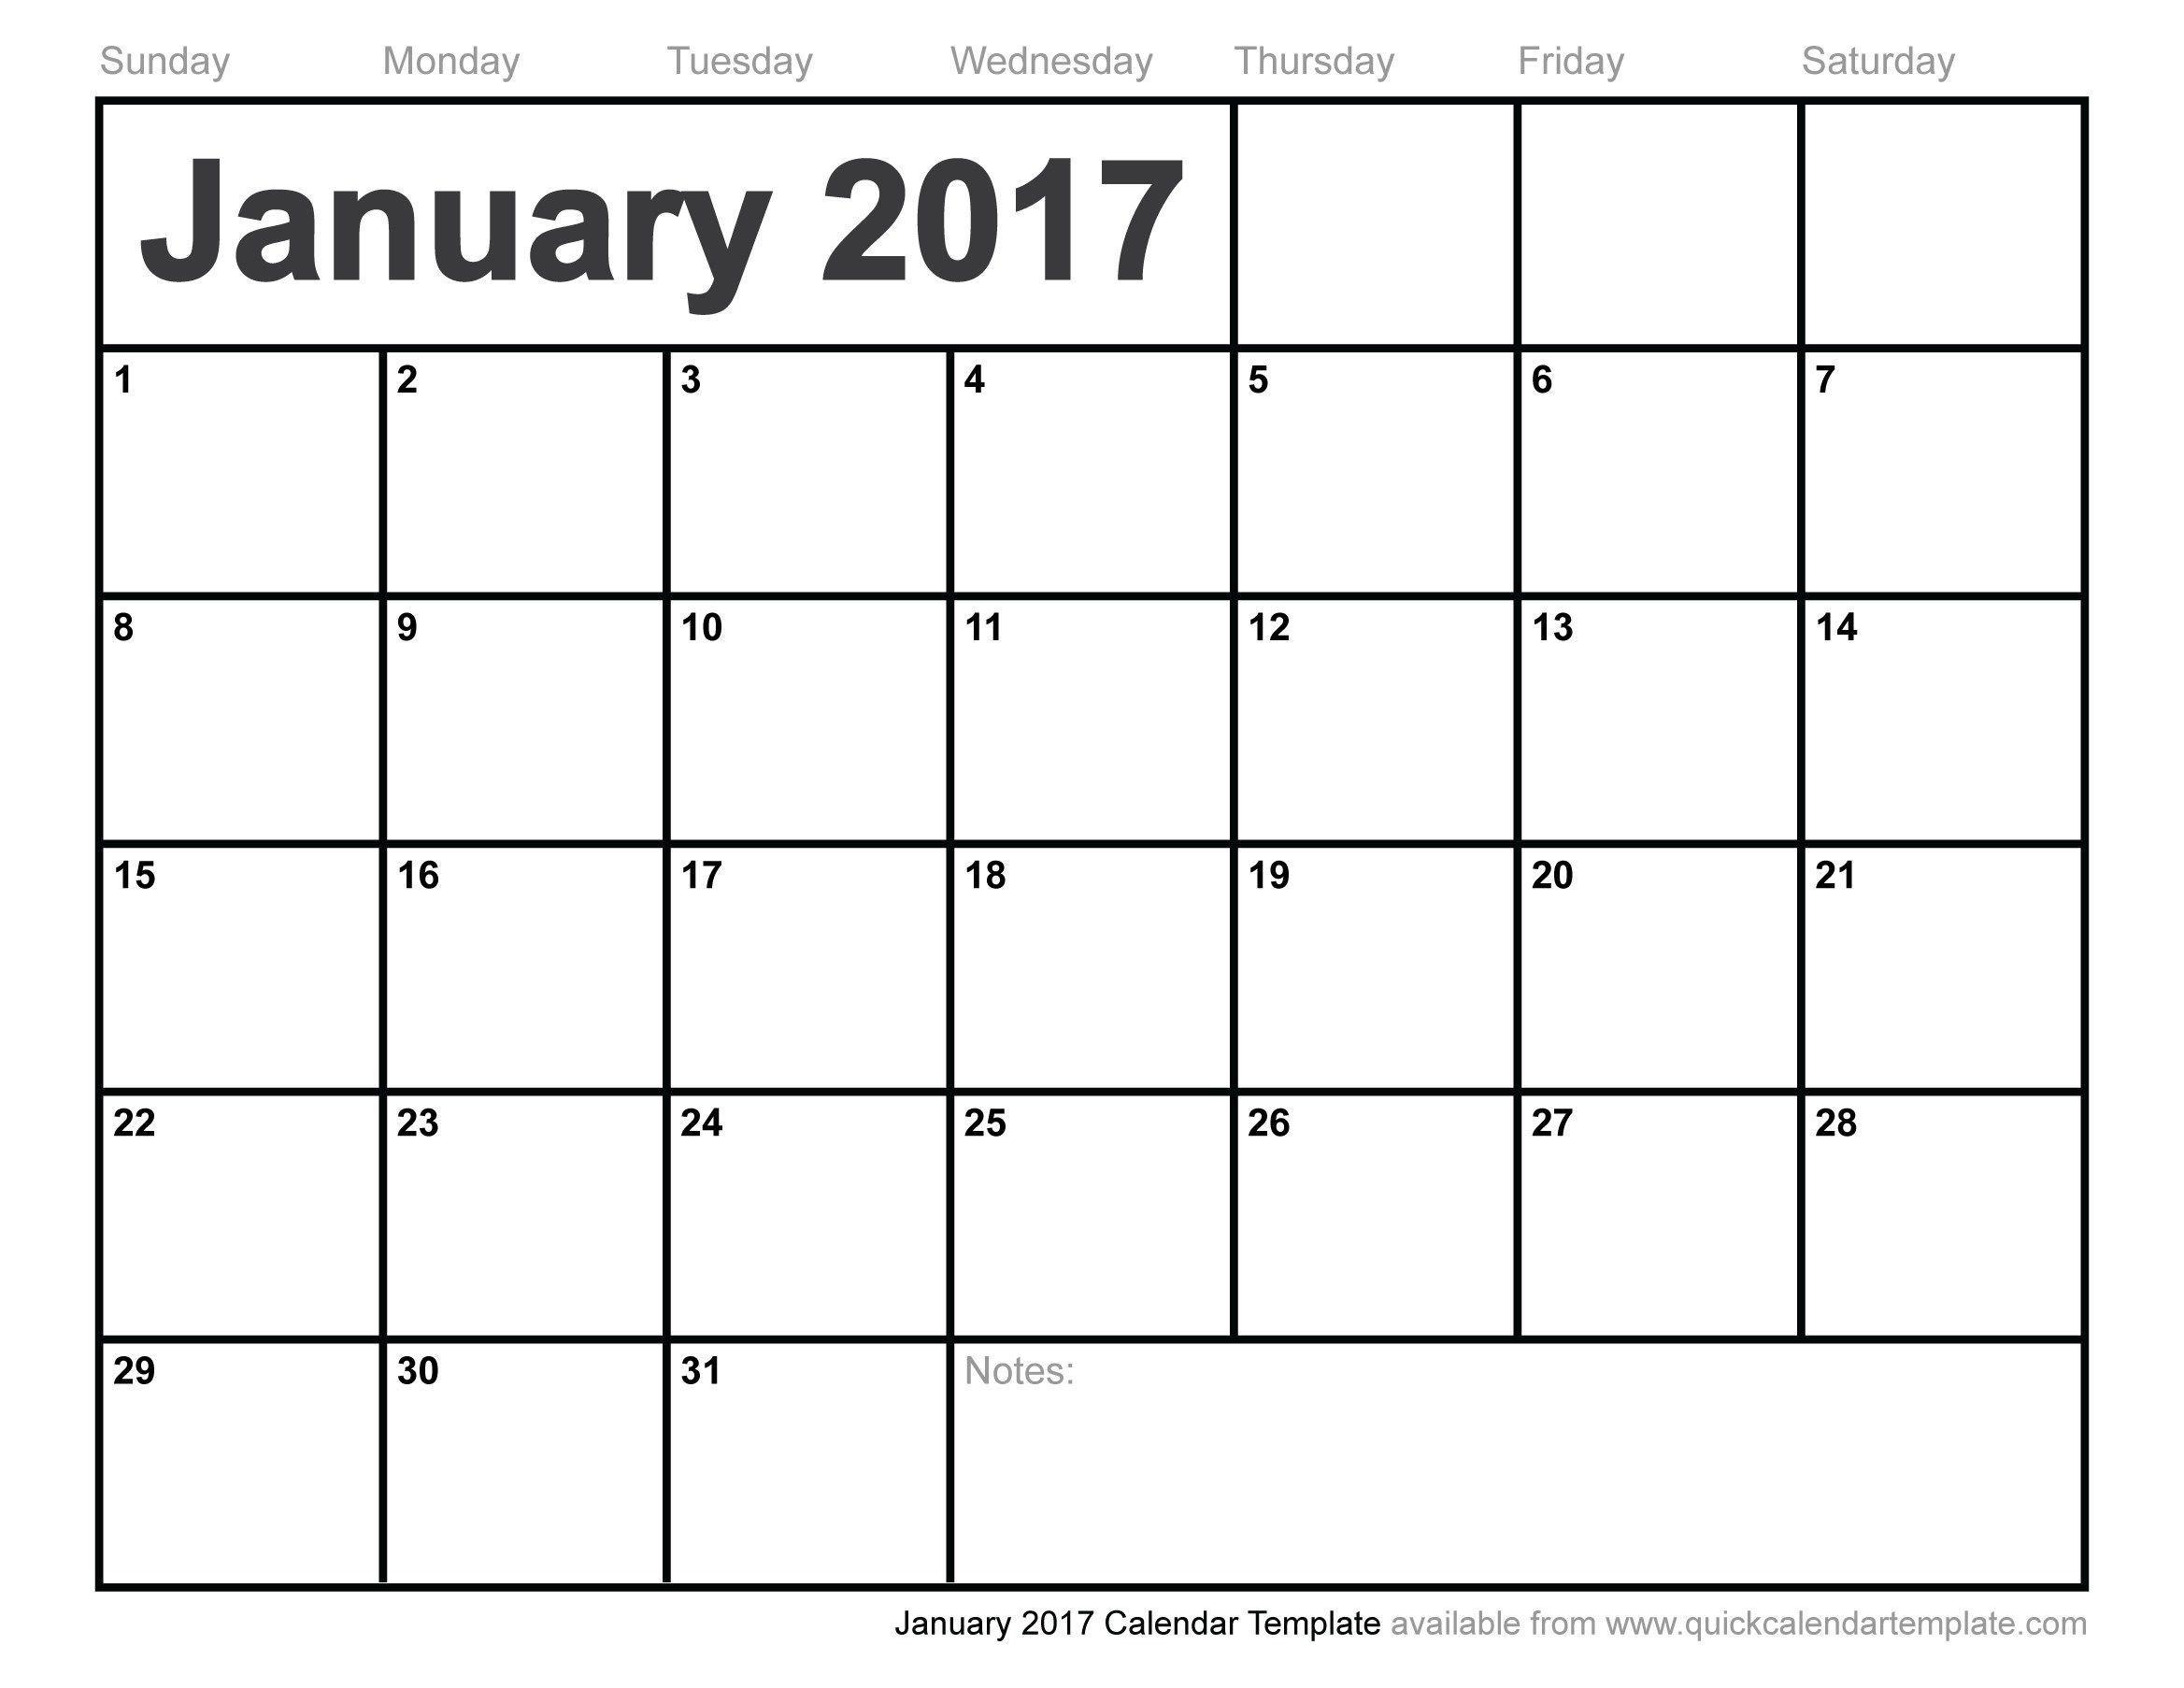 Win Calendar Wallpaper : Desktop wallpapers calendar january wallpaper cave